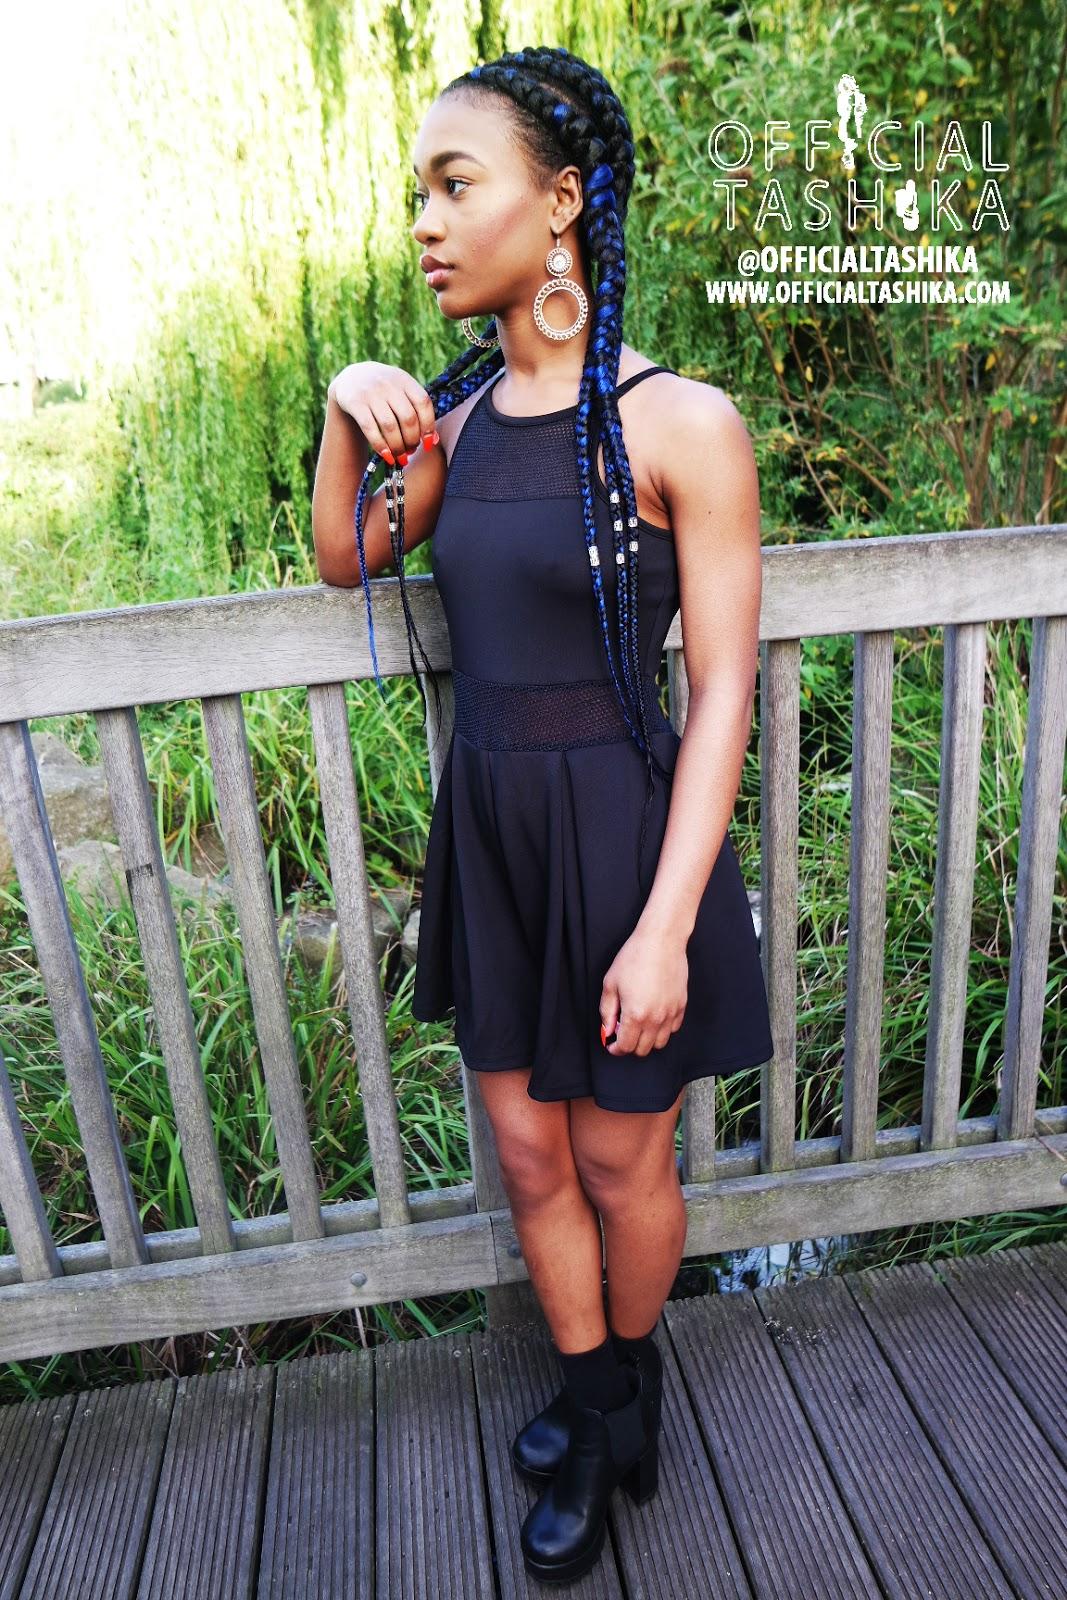 Tashika Bailey | That Little Black Playsuit